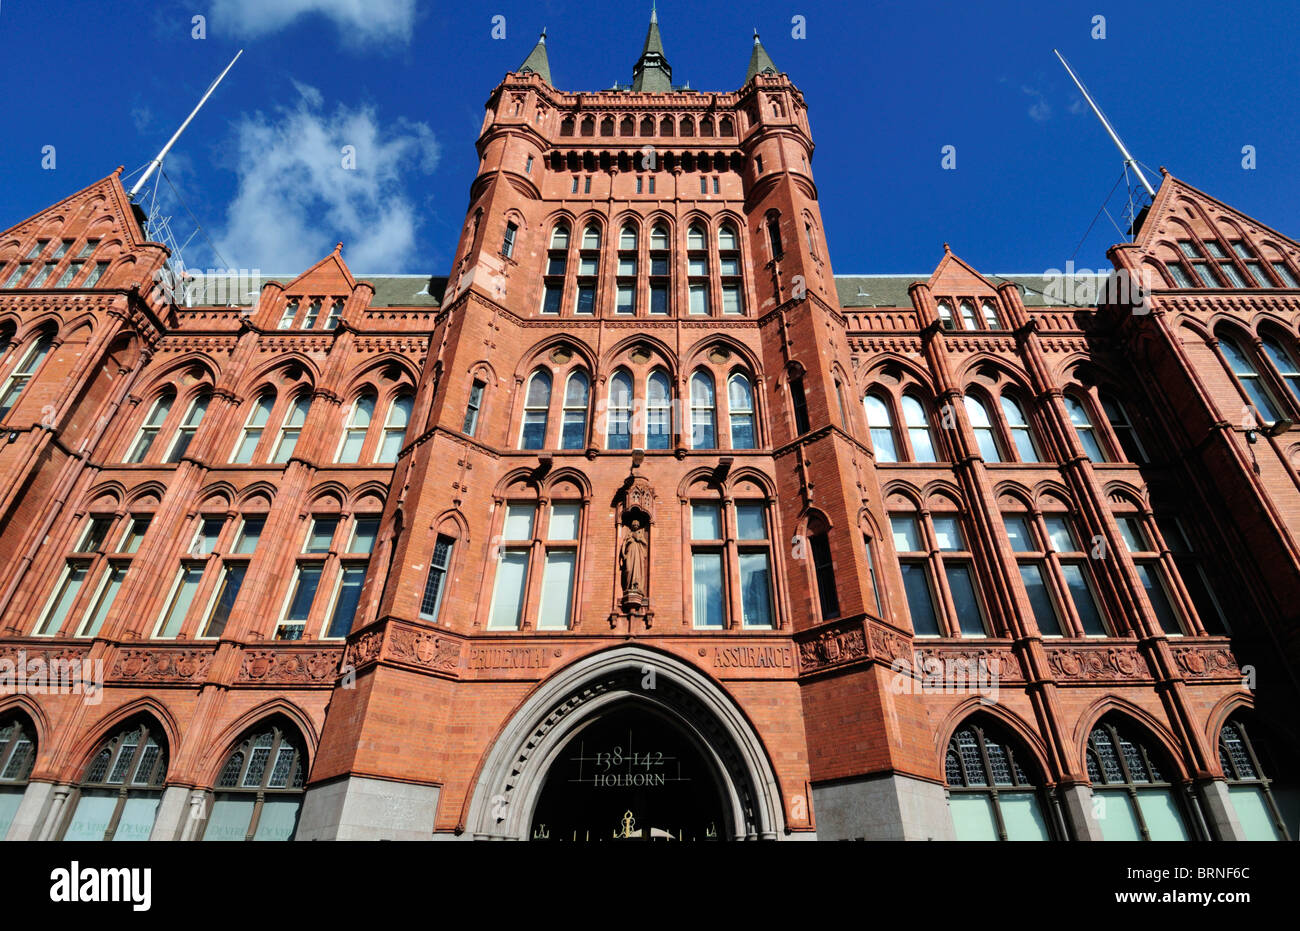 Holborn Bars, Prudential Assurance building, High Holborn, London, United Kingdom - Stock Image